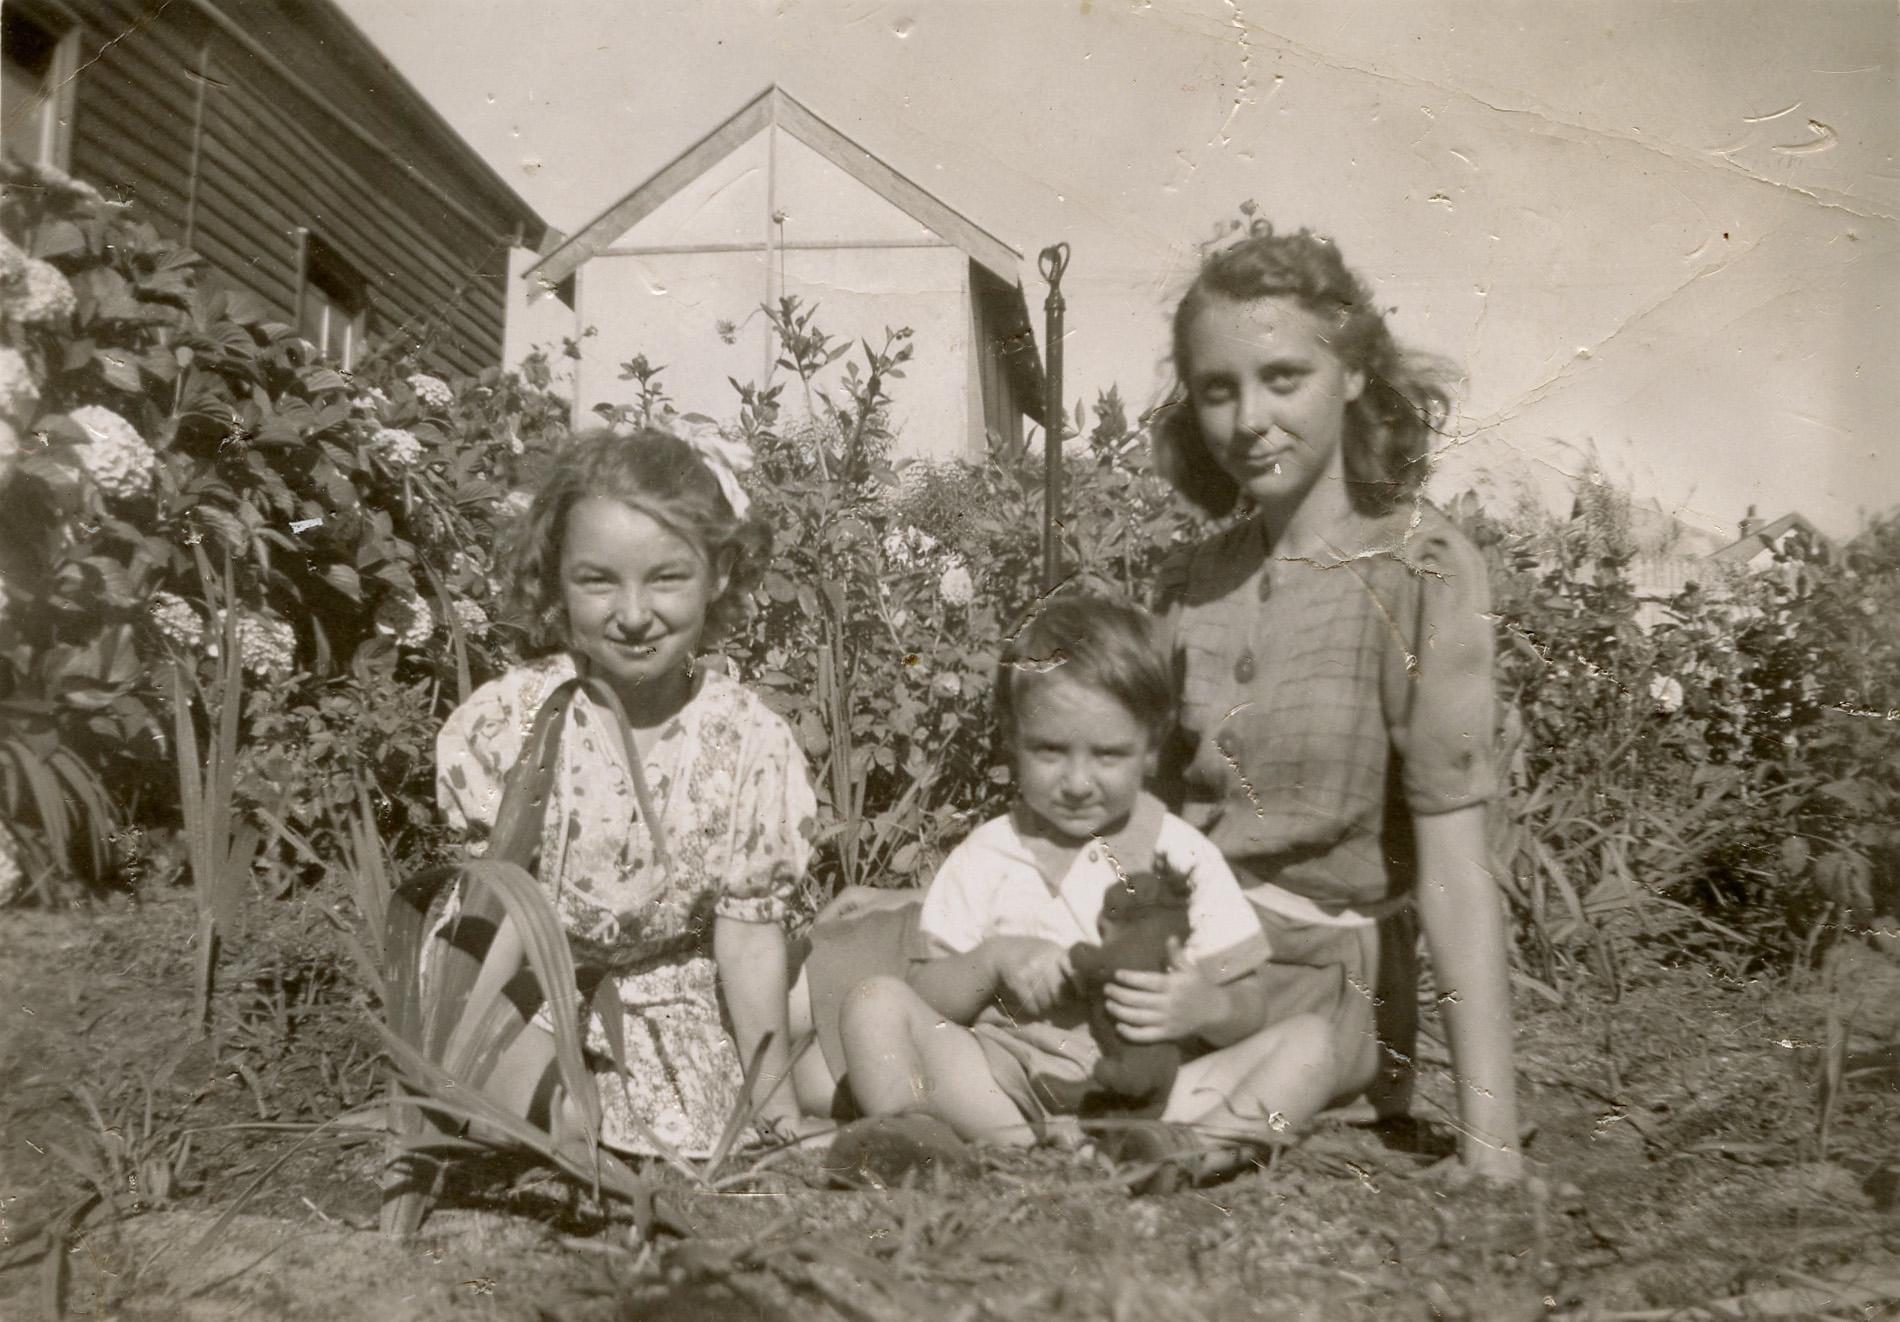 33. Peach Street garden, 1940s